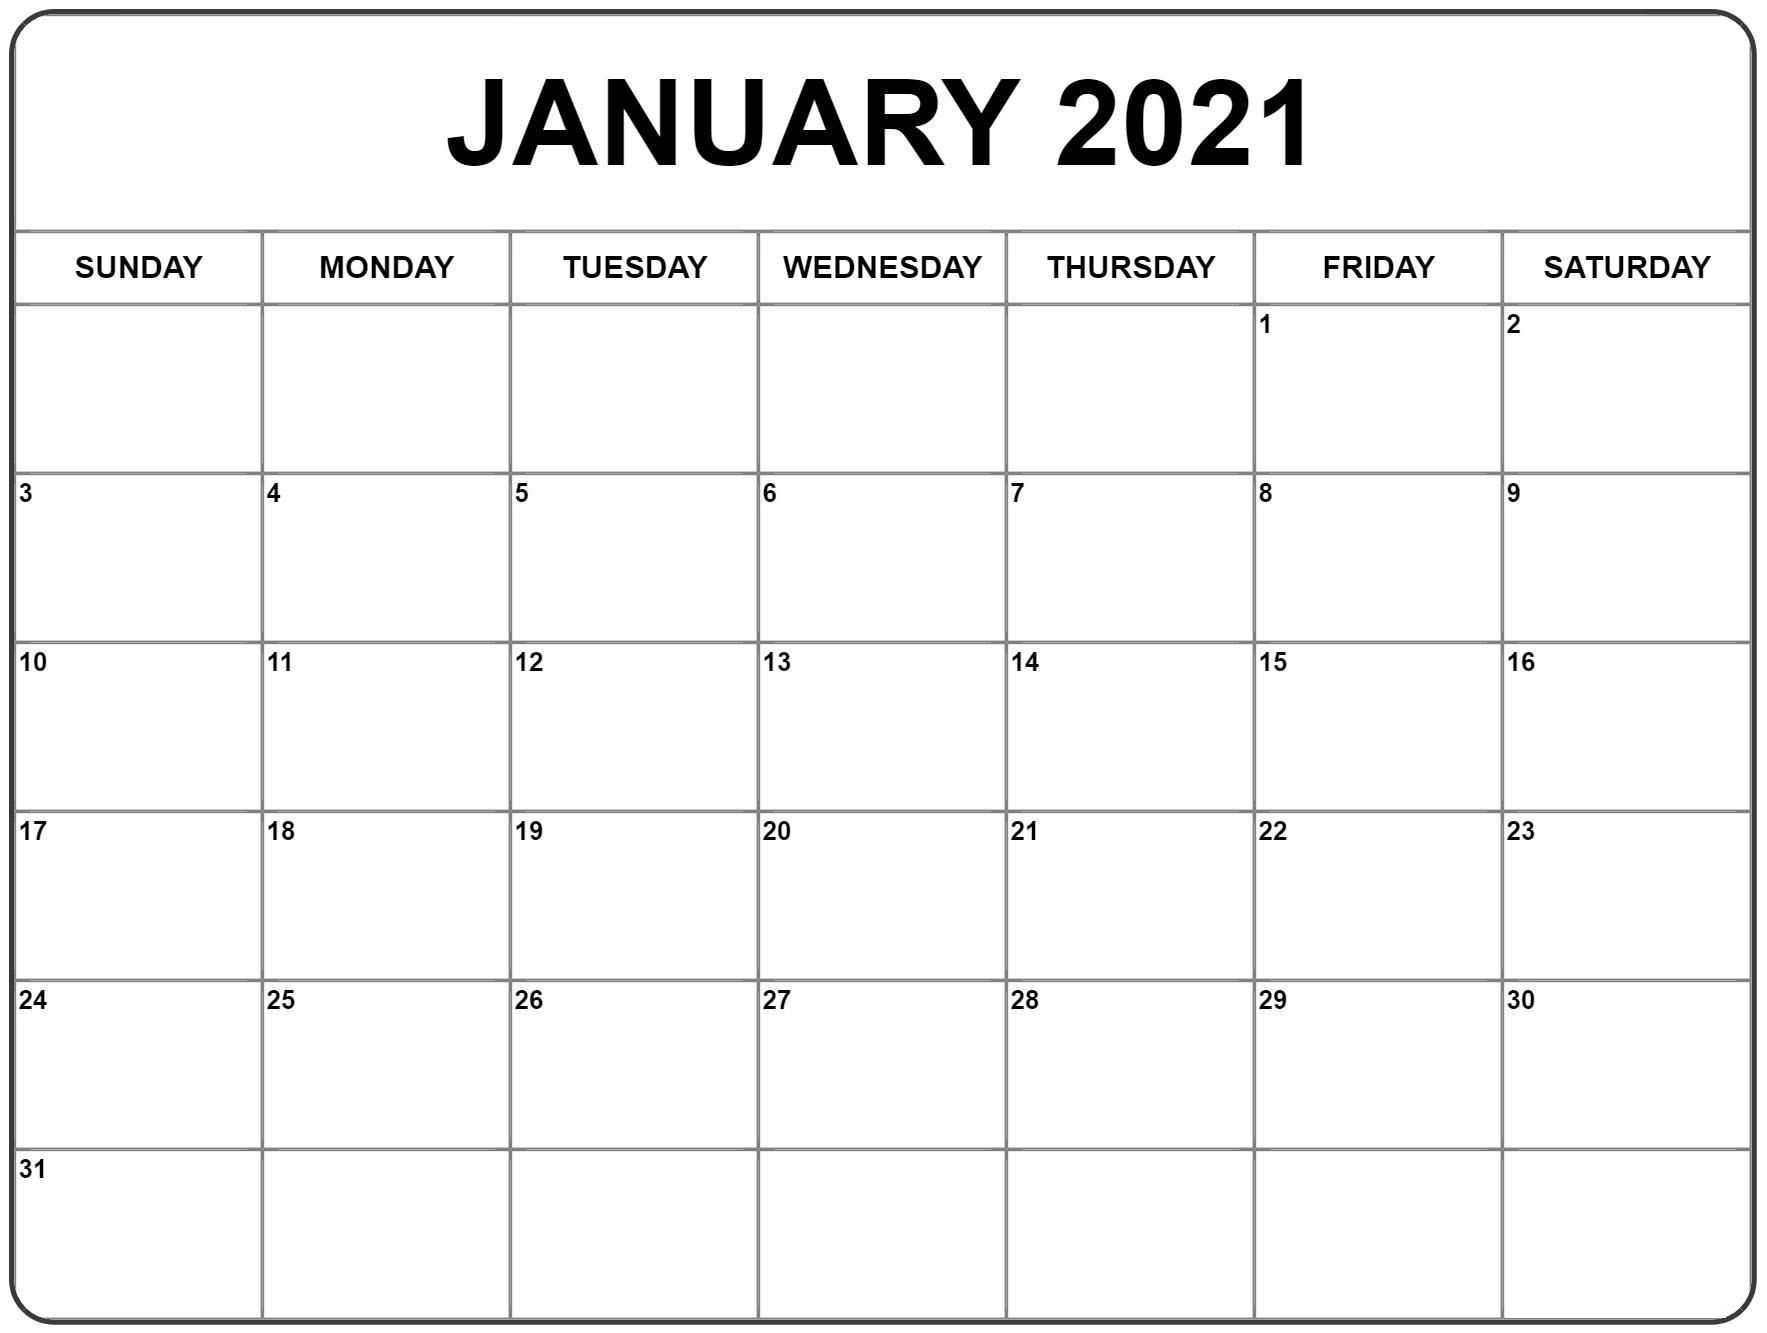 Free January 2021 Calendar Printable Blank Templates 5